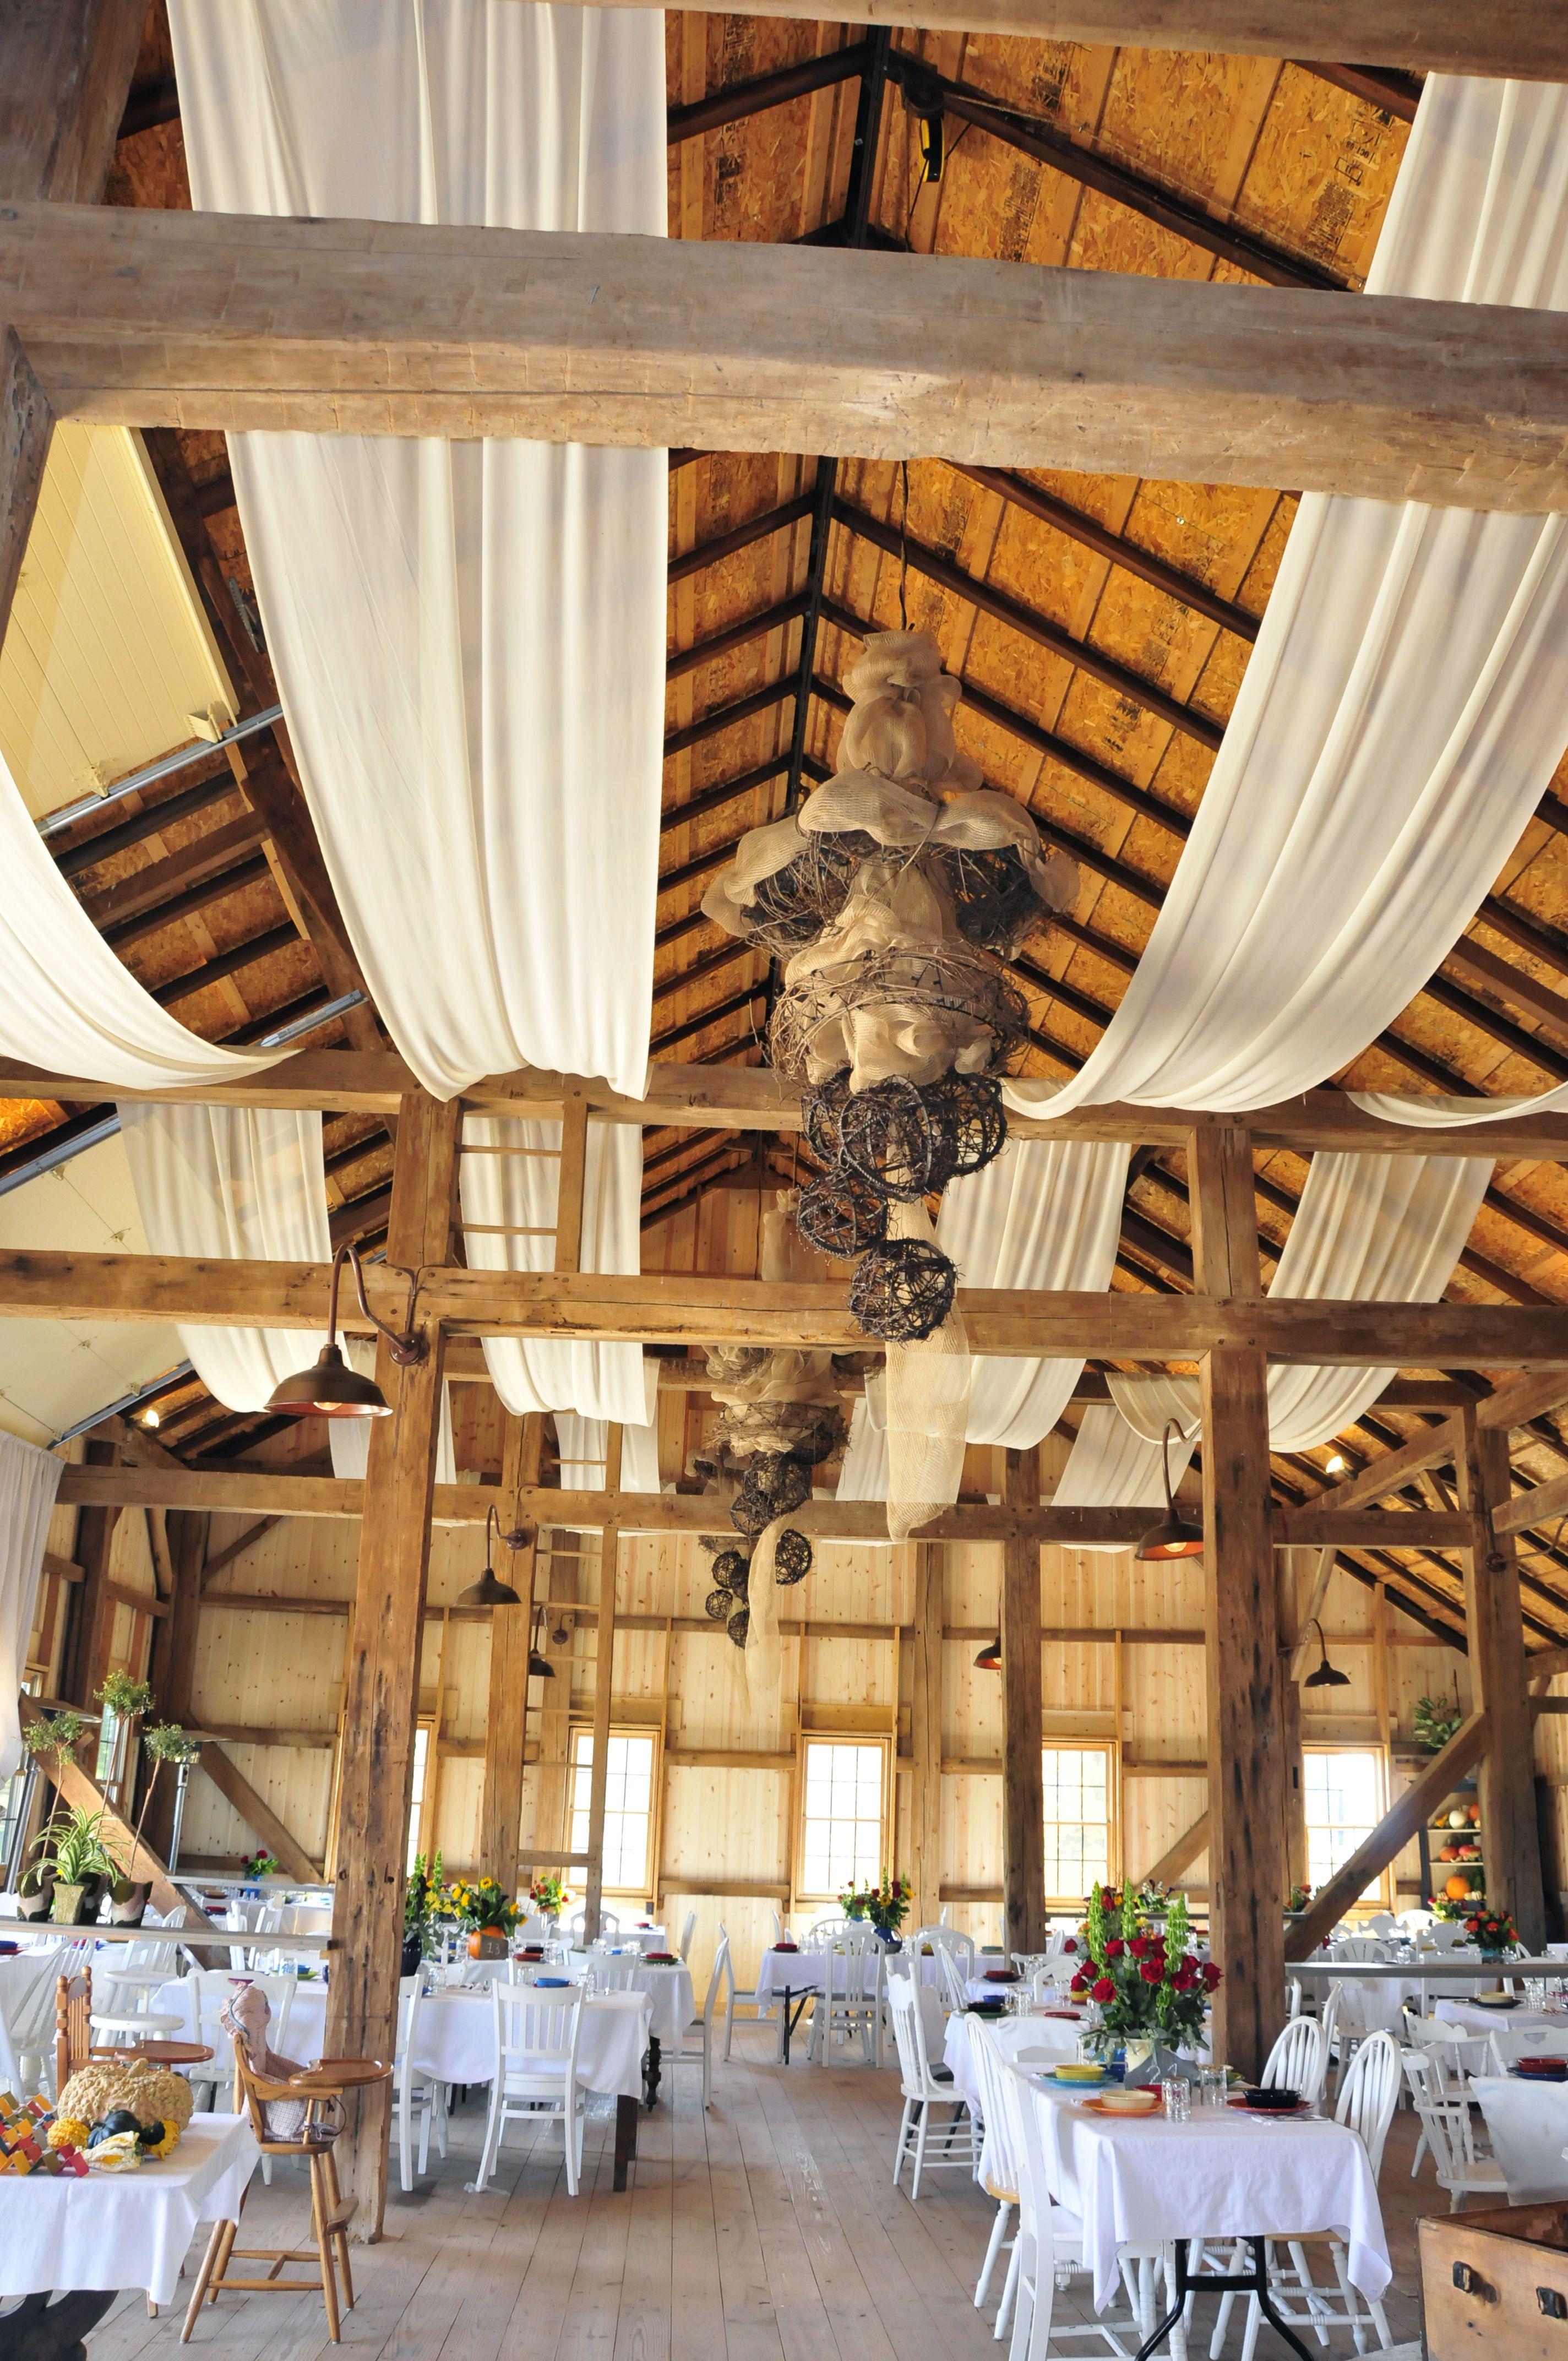 Vintage Barn For Wedding Ceremony And Receptions Peacockridge: Vintage Barn Wedding Venue At Websimilar.org